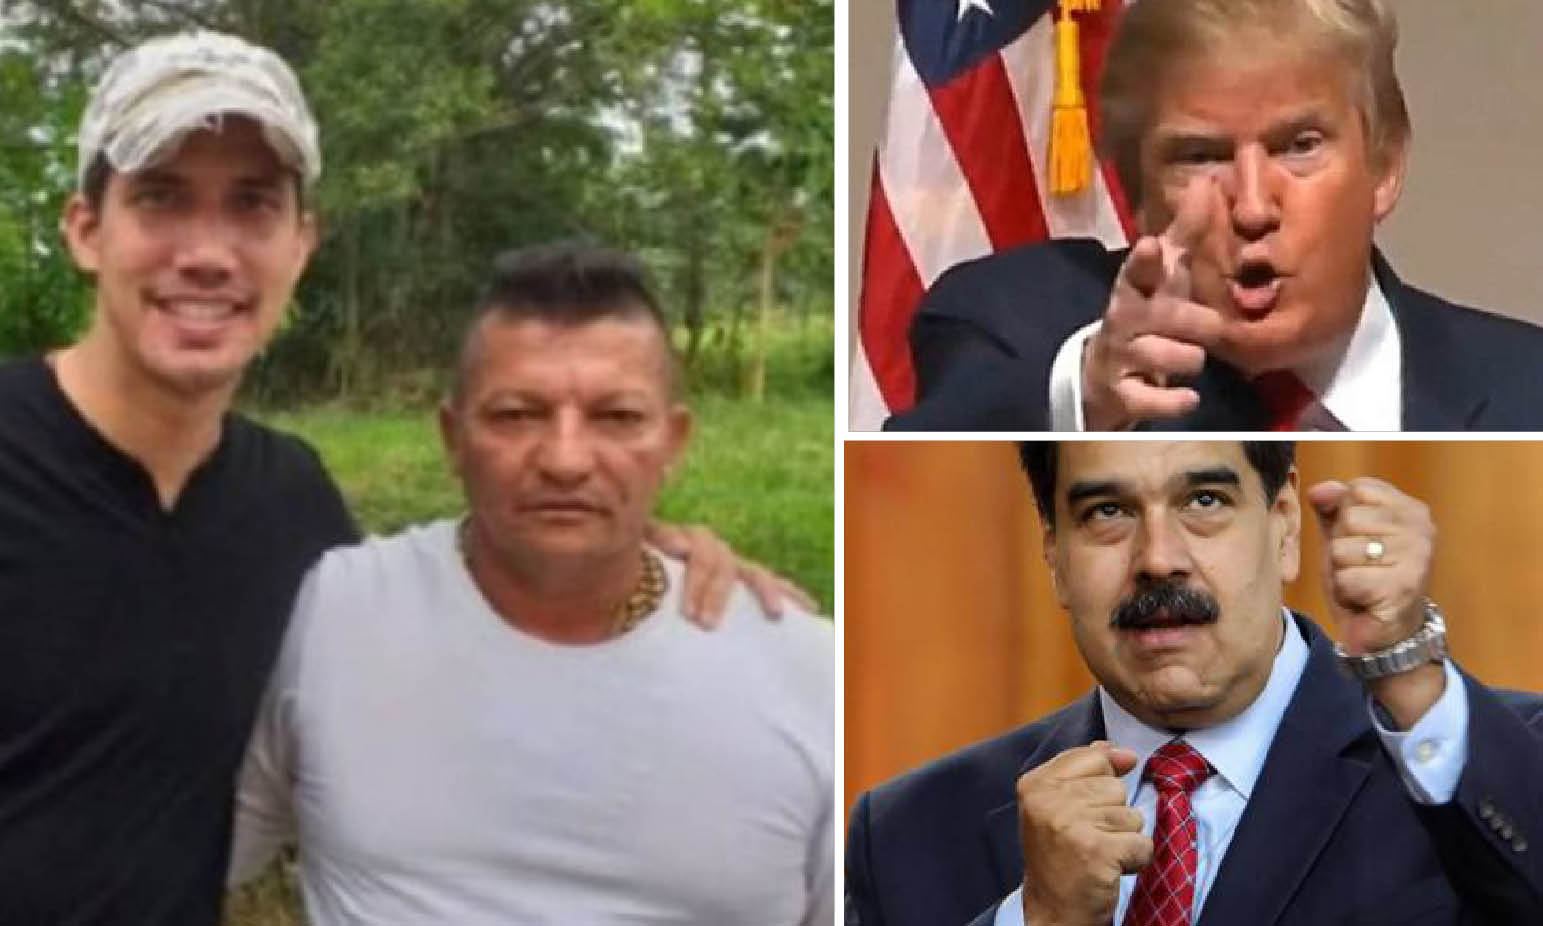 Venezuela: Guaido's Friends ParaMilitary Narcos Tied to Italian Mafia but Trump charges Maduro